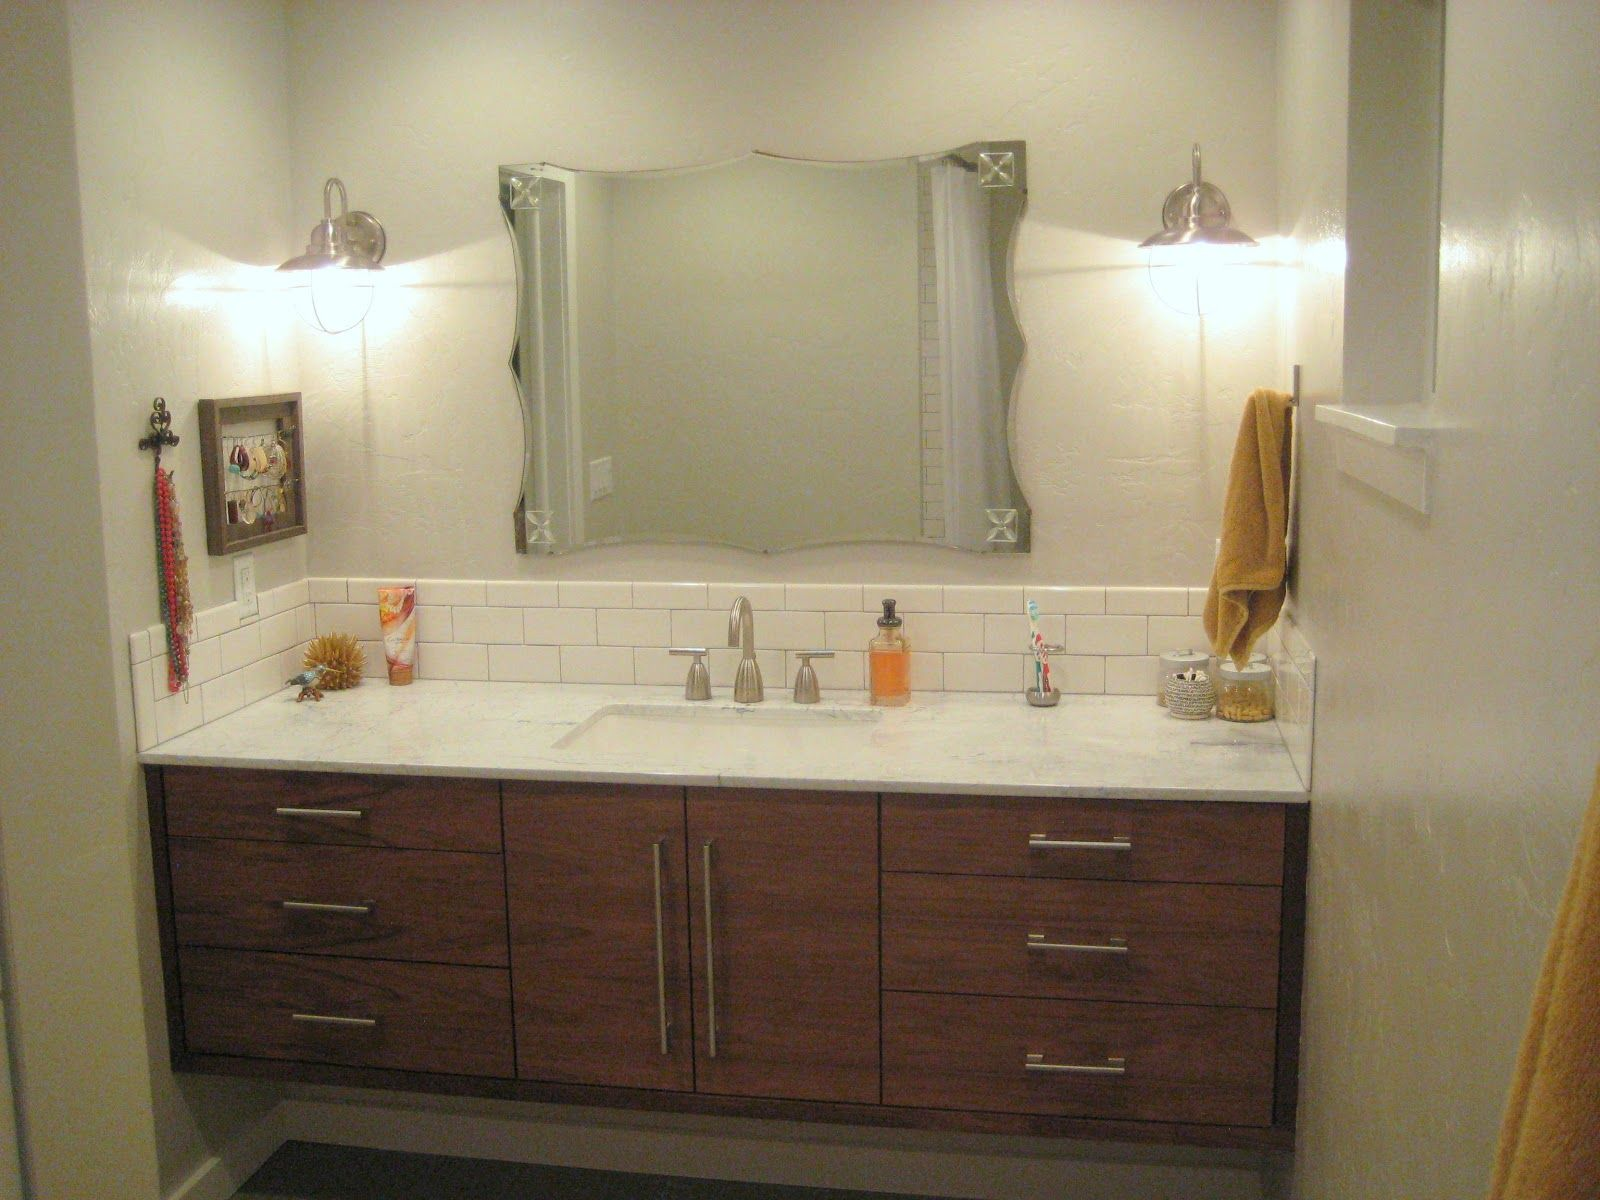 bathroom vanities albany ny. Narrow Bathroom Vanity With Charming Vanities Single Sink And Unique Beveled Mirror Shape Design Albany Ny Y